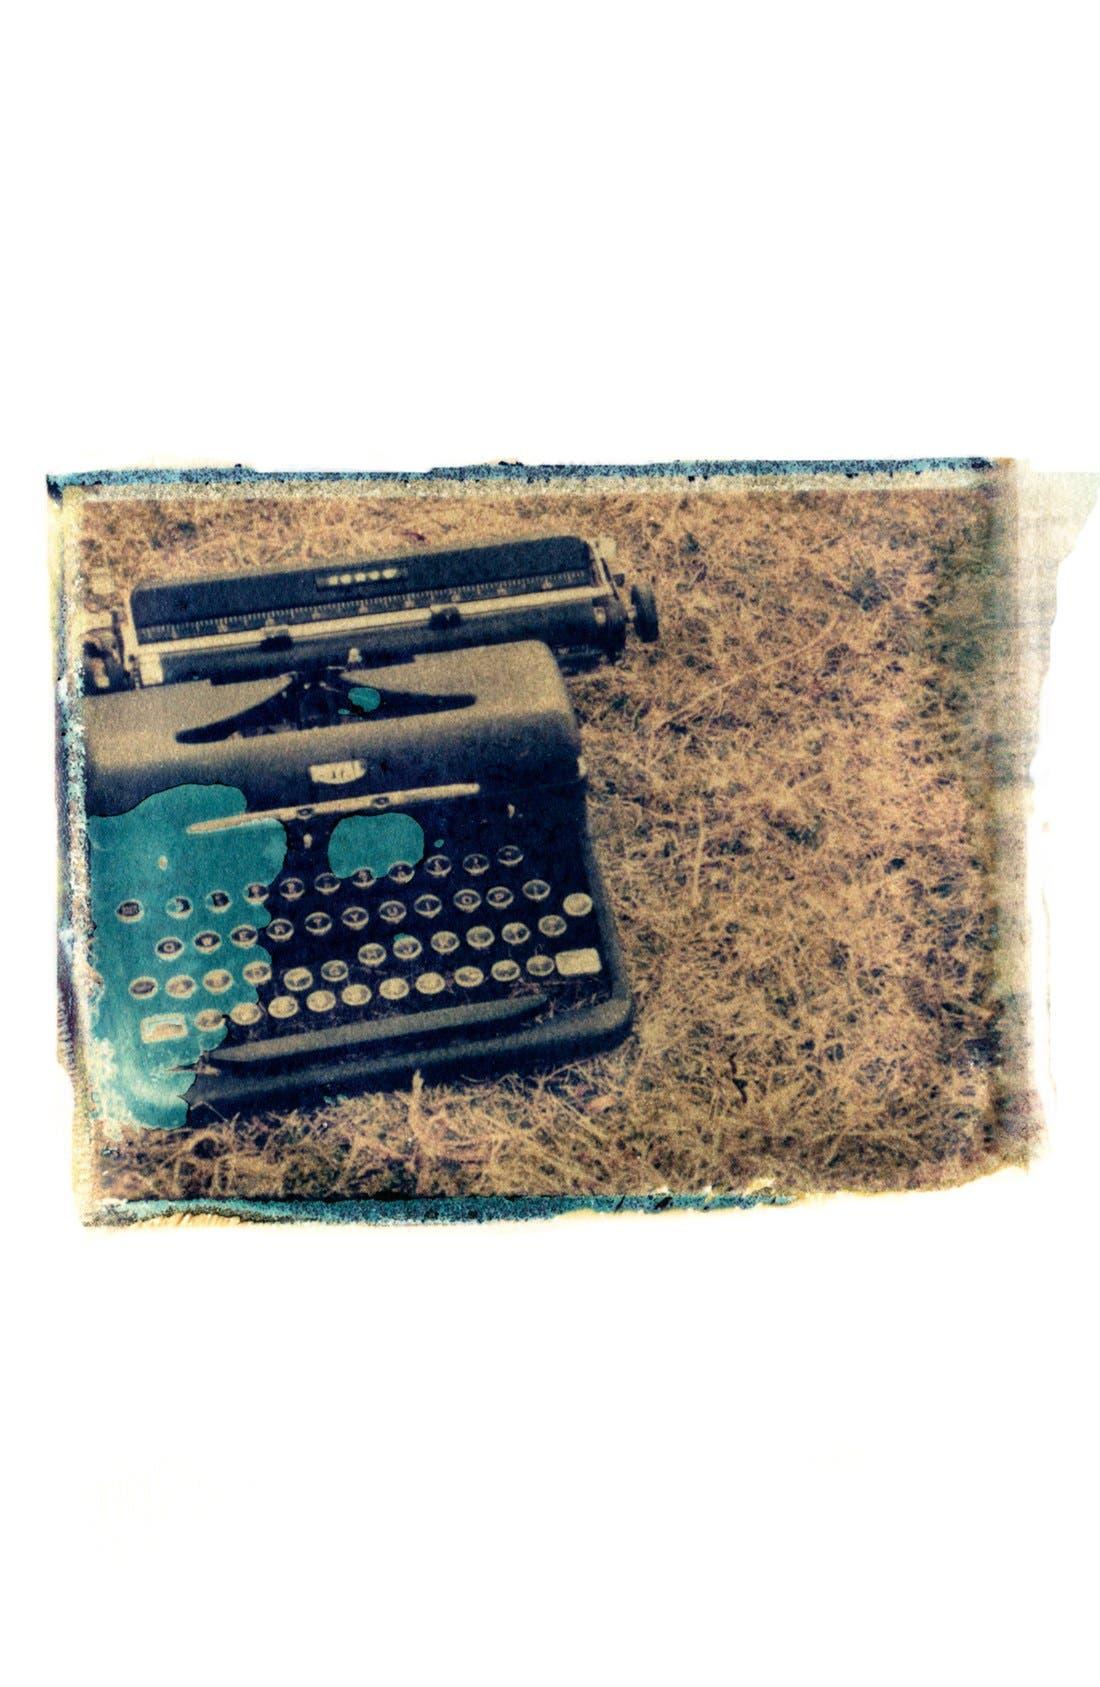 Alternate Image 1 Selected - She Hit Pause Studios 'Typewriter in Field' Wall Art